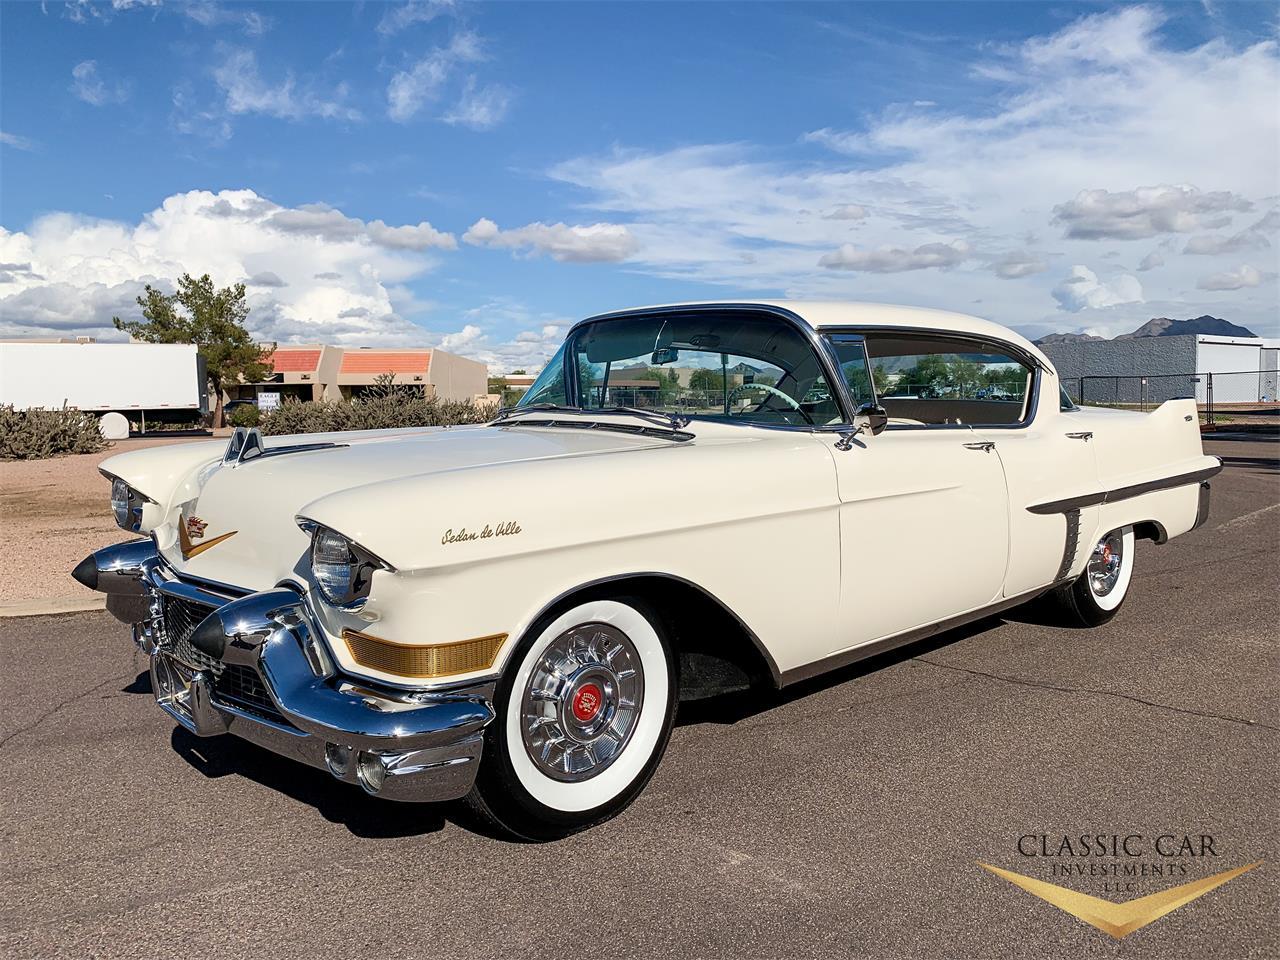 1957 cadillac sedan deville for sale   classiccars   cc-1172838